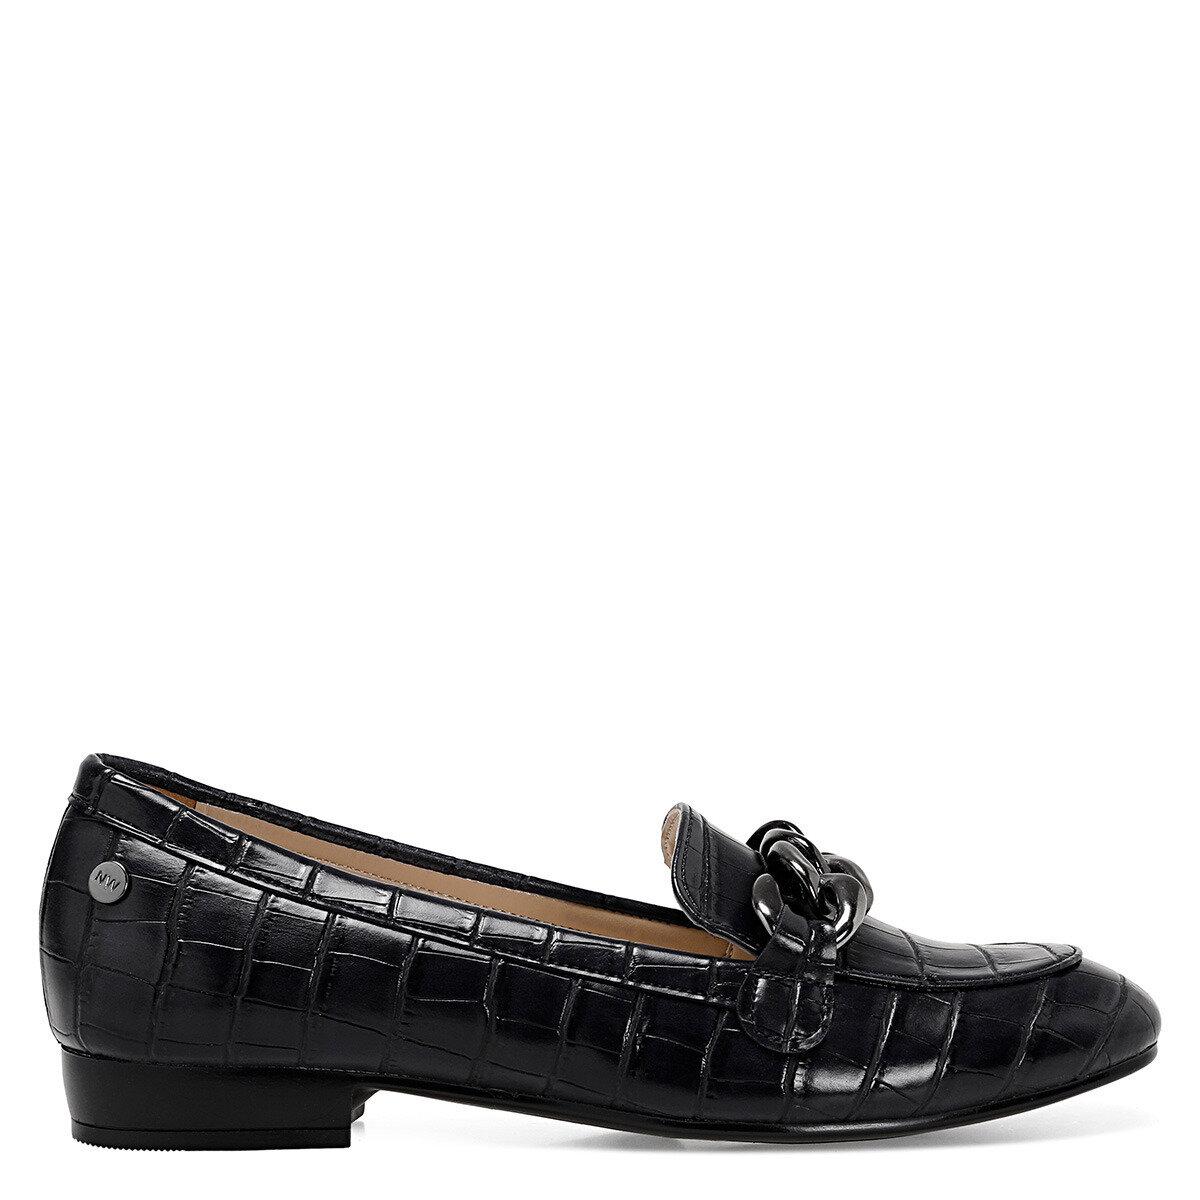 CROMA Siyah Kadın Loafer